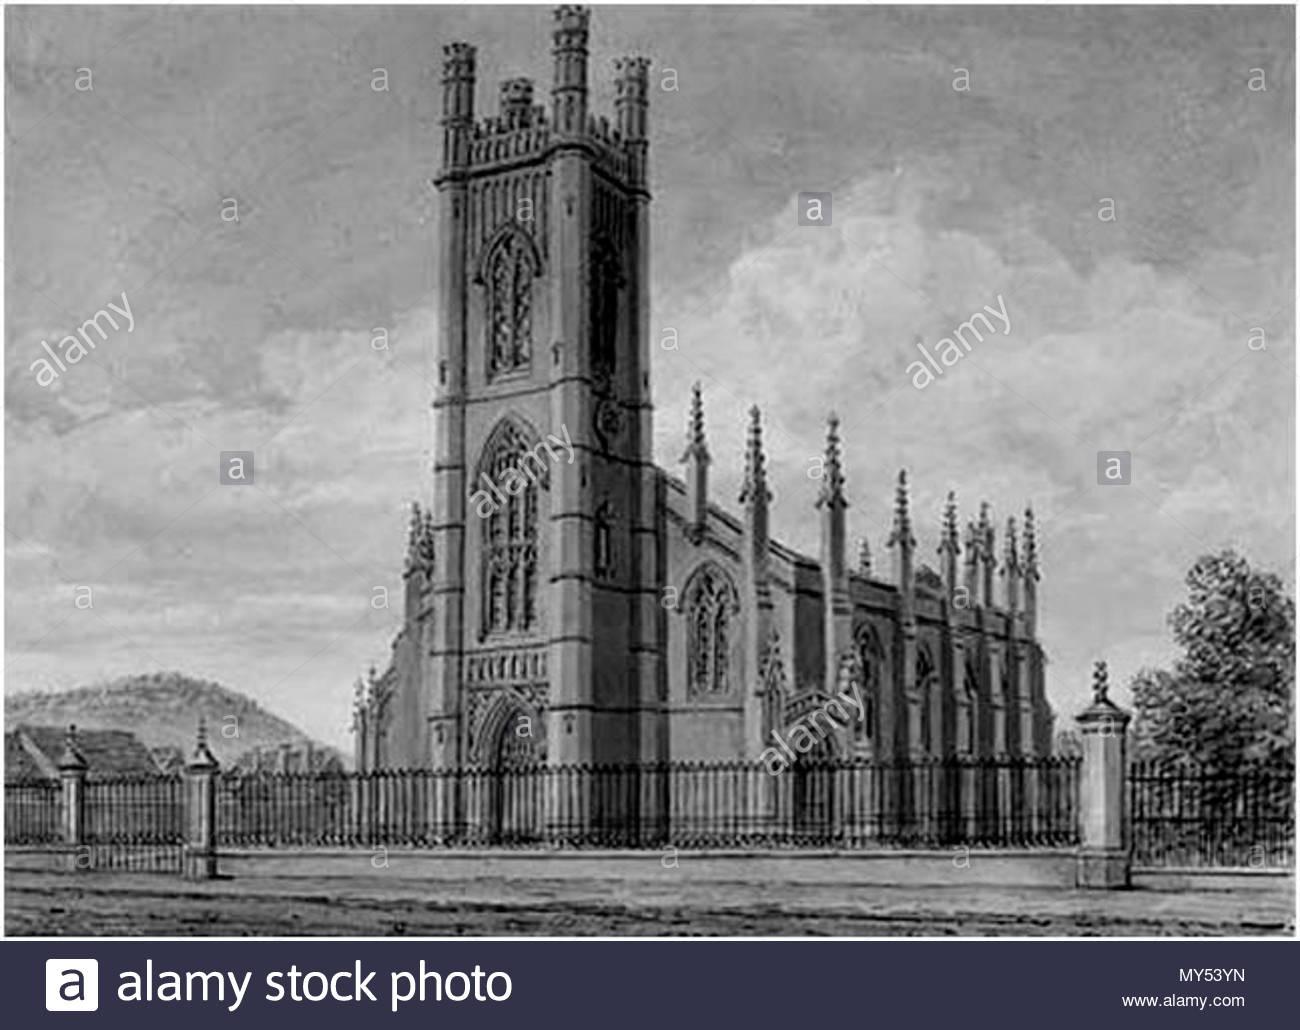 . English: Holy Trinity church Burton Upon Trent Staffordshire England. 3 October 2009. N S Aspdin 244 Holy Trinity Church Burton on Trent - Stock Image